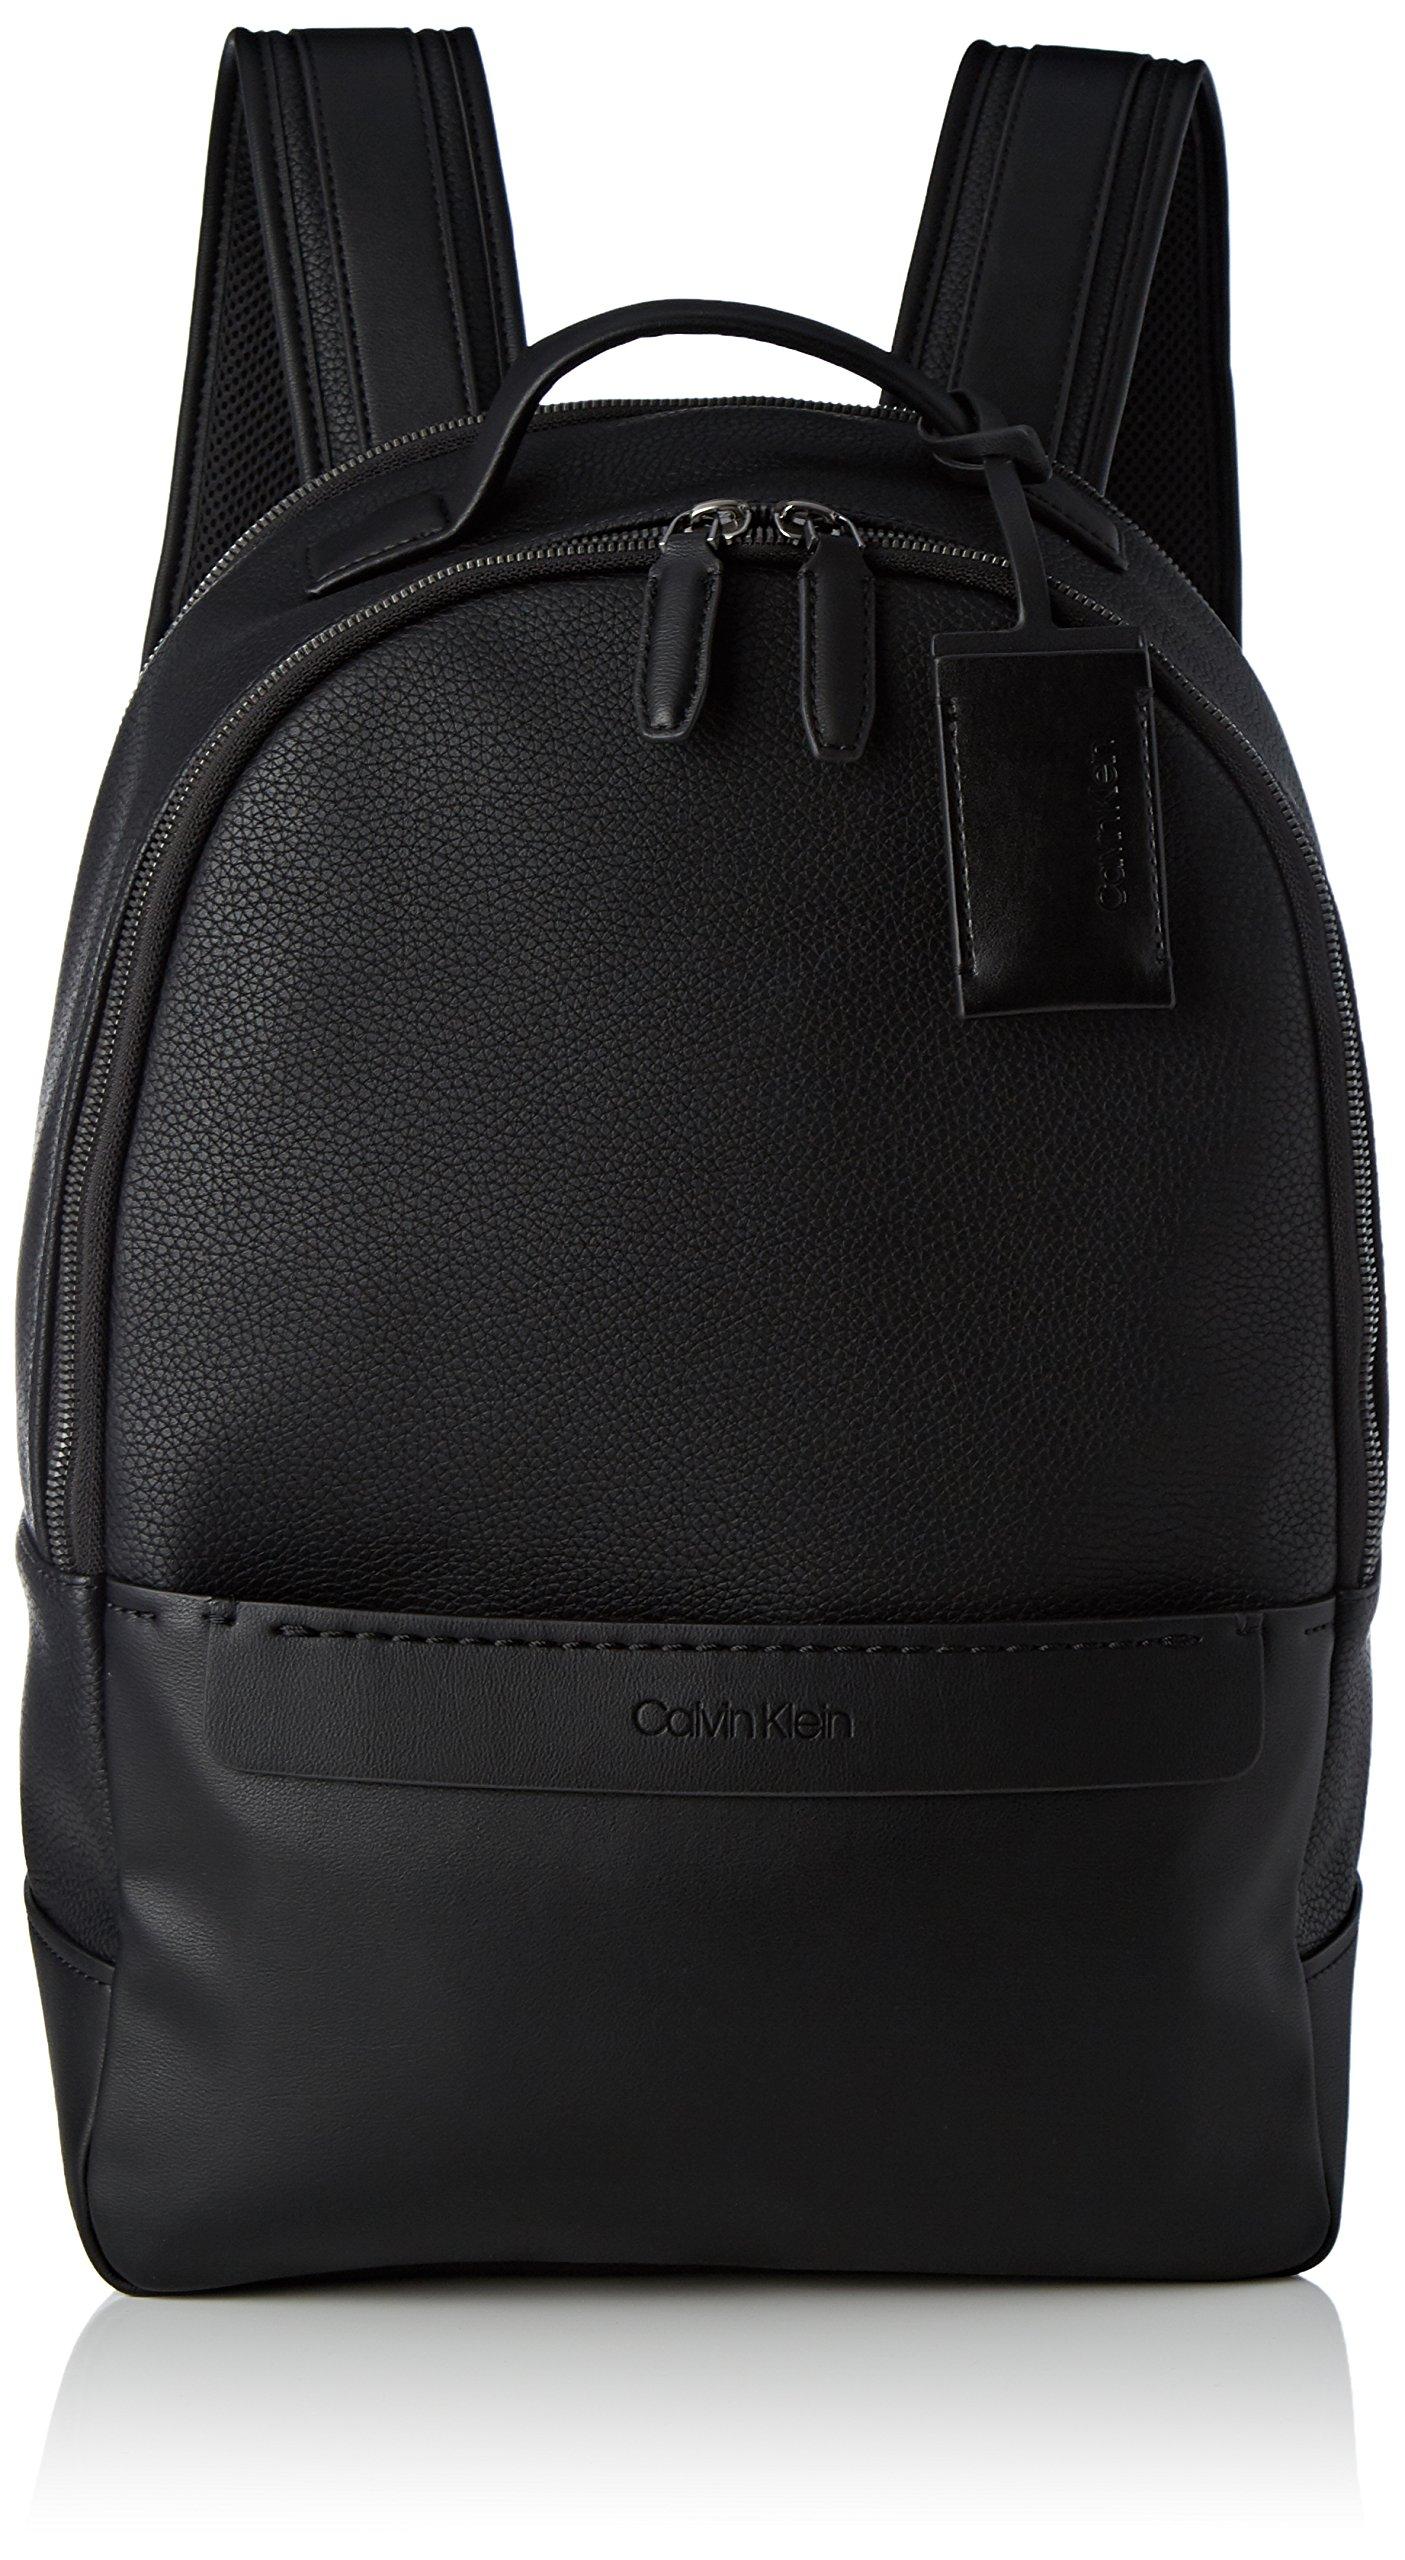 Calvin Klein Jeans – Multi Task P Backpack, Mochilas Hombre, Negro (Black), 16x43x32 cm (B x H T)